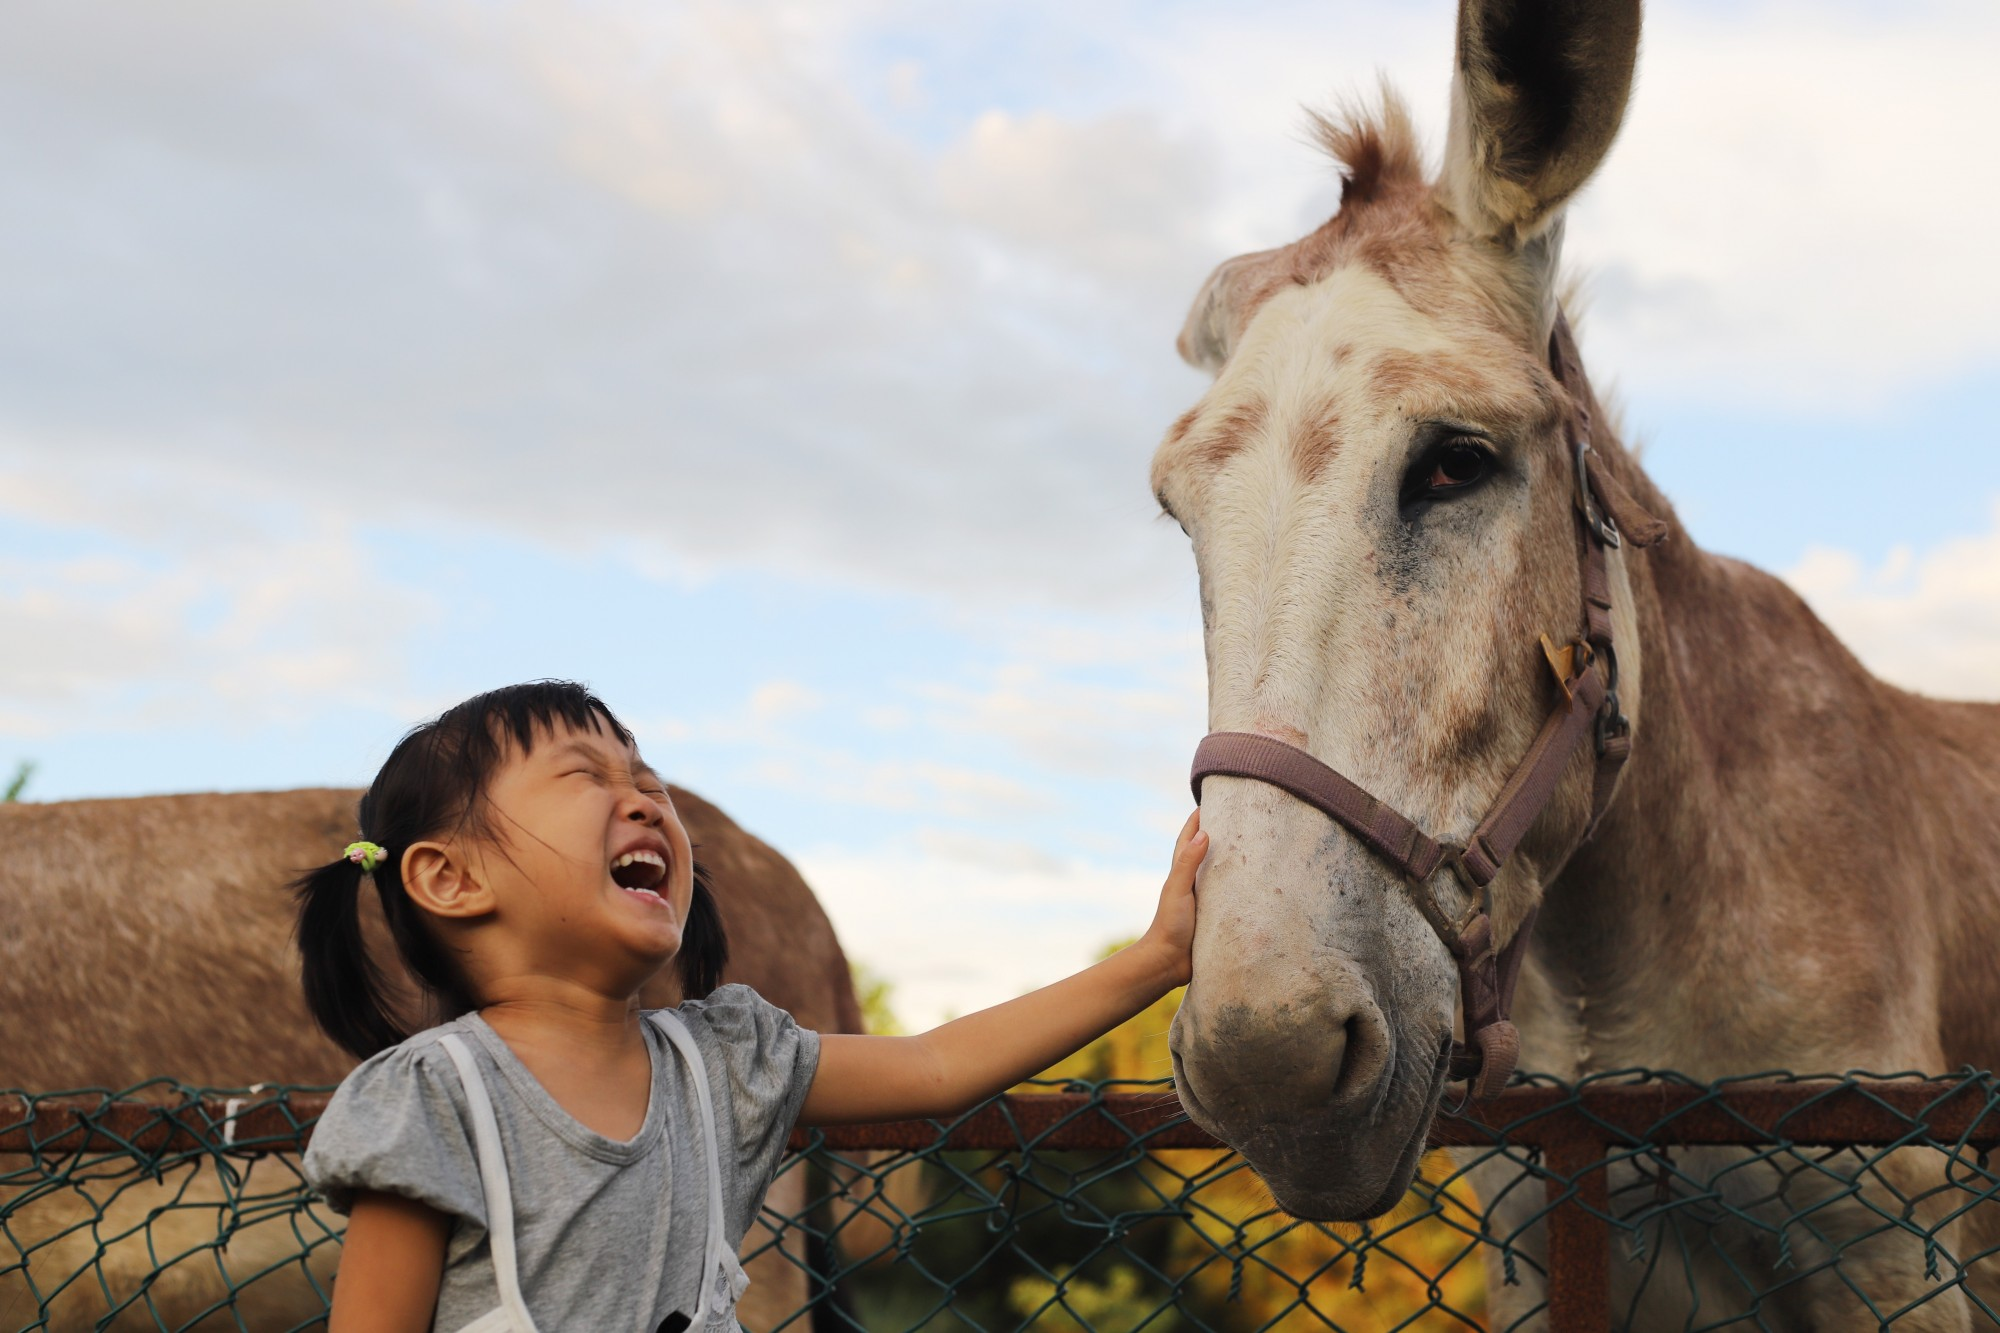 Young girl feeding a giraffe